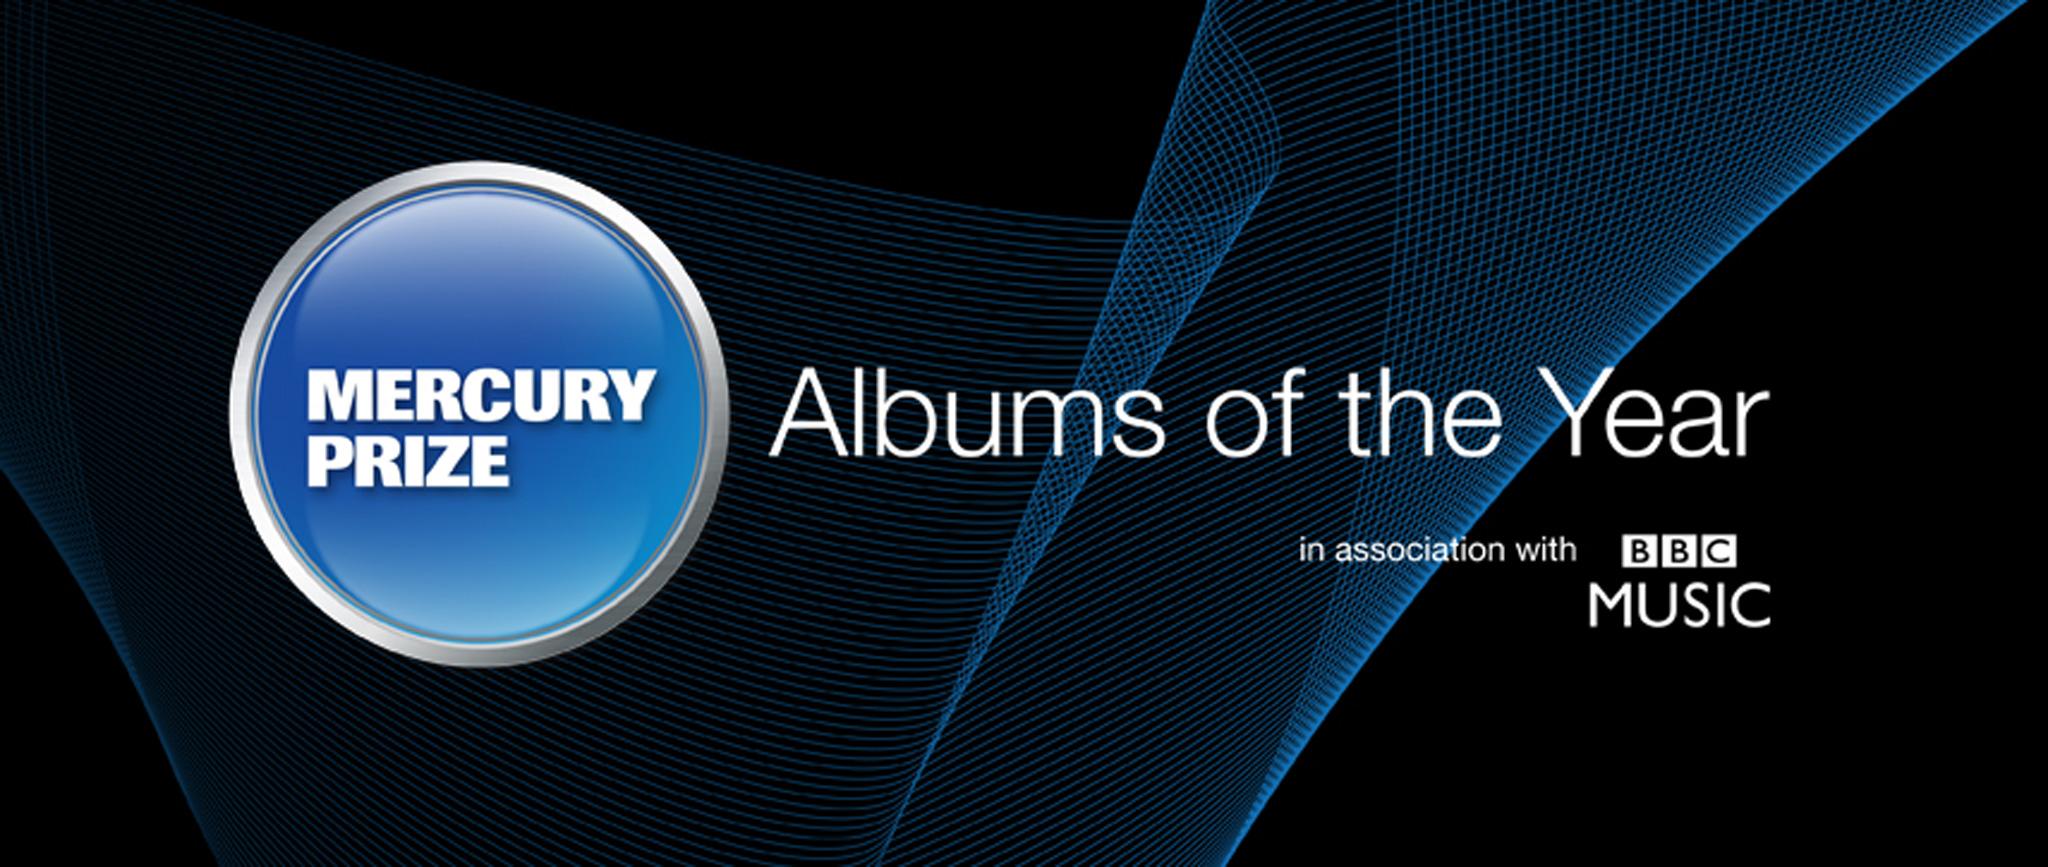 Mercury-music-BBC